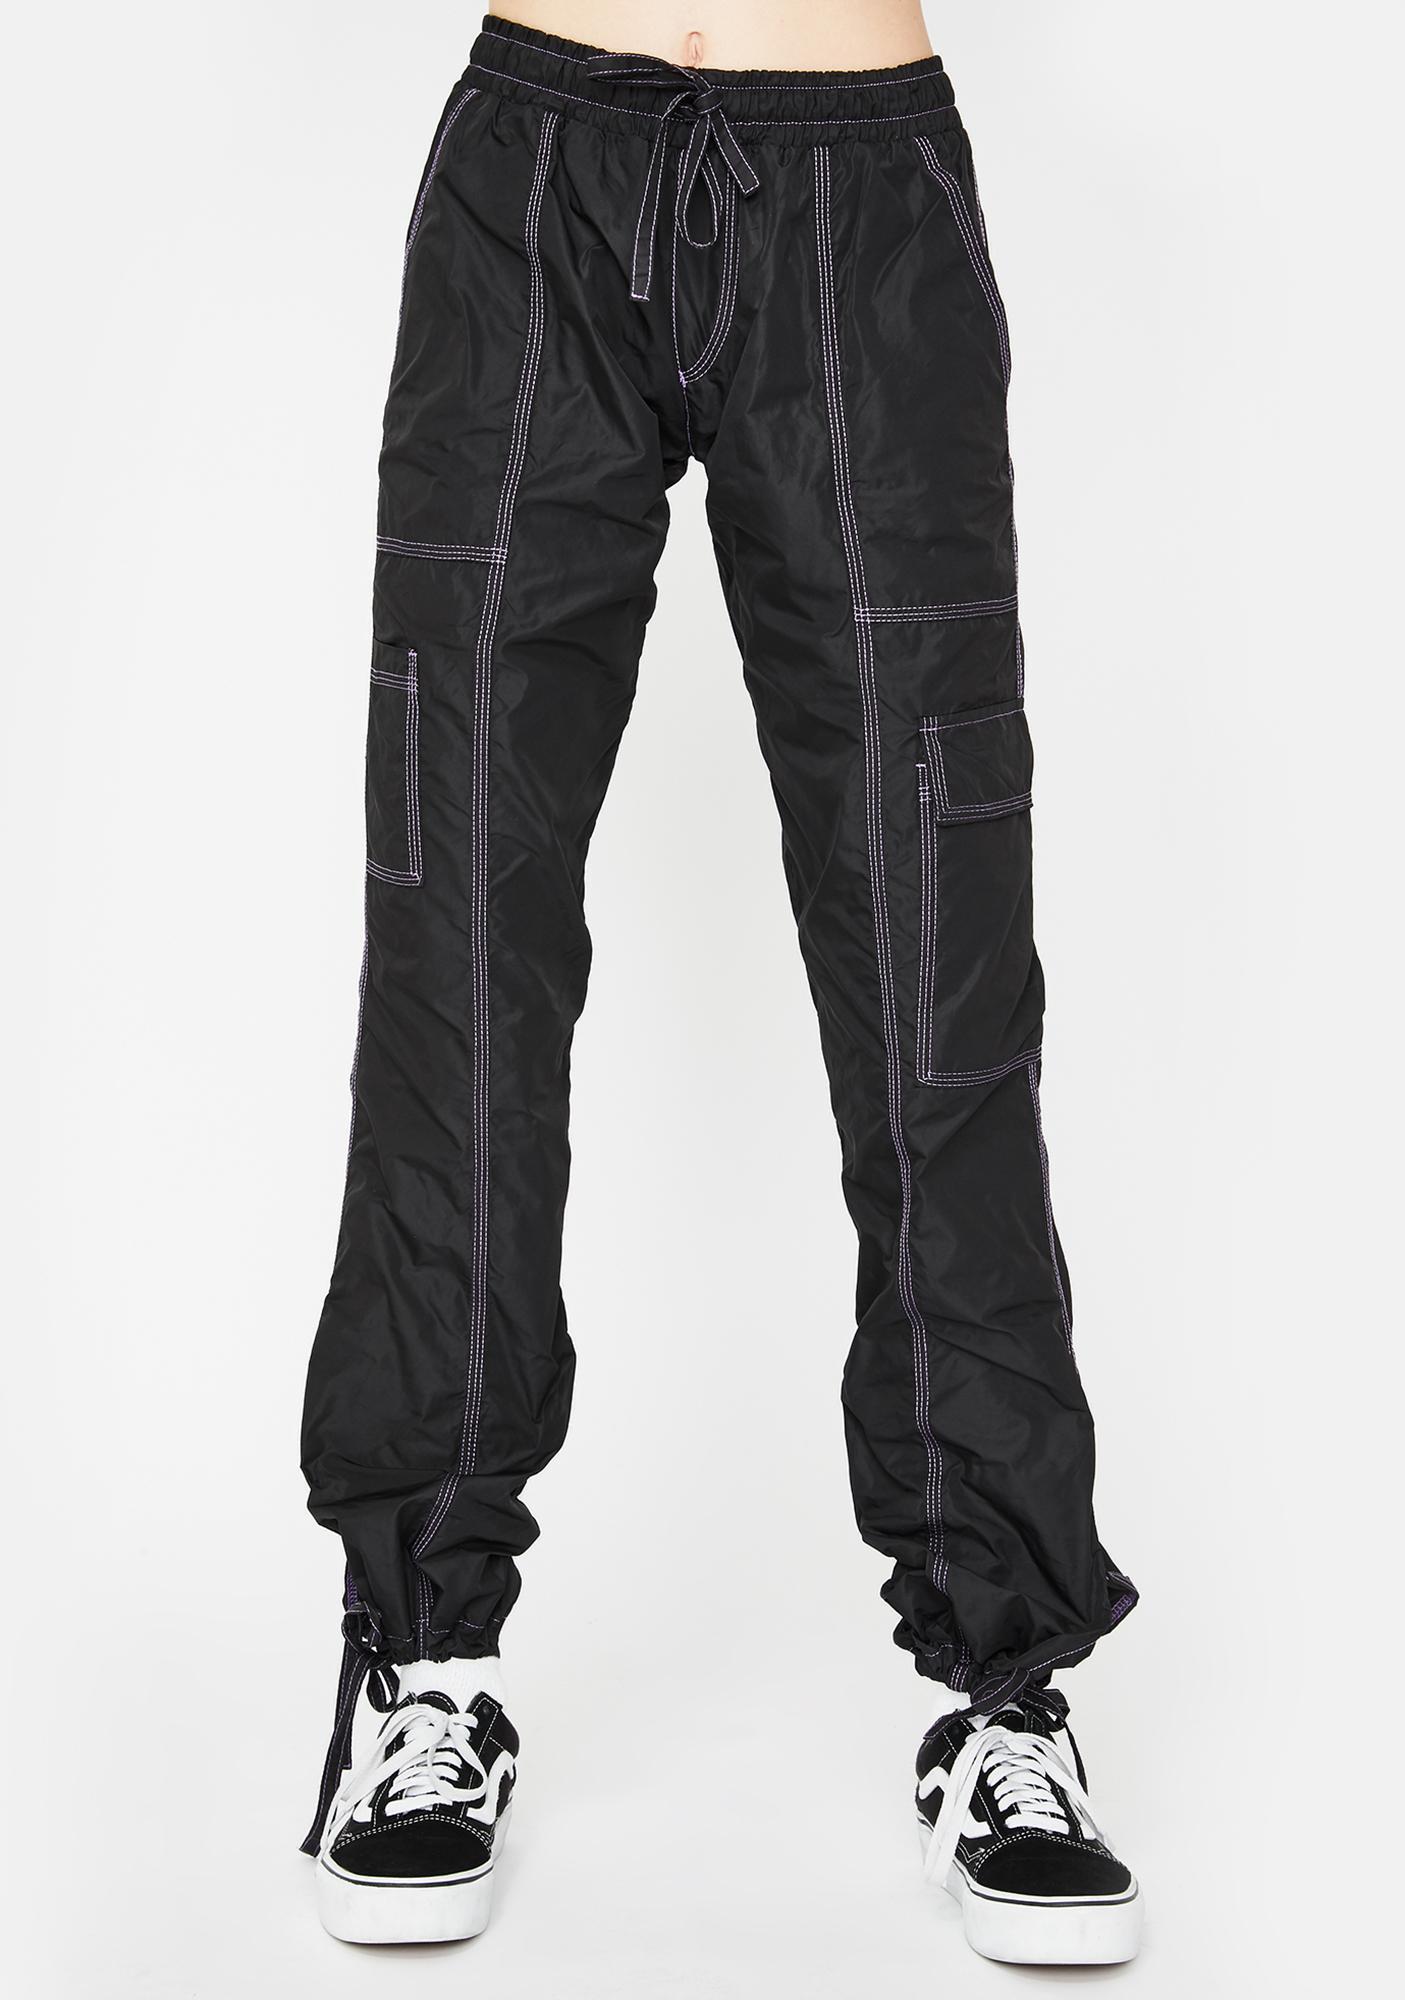 DOOM 3K Cyber Goth Cargo Pants